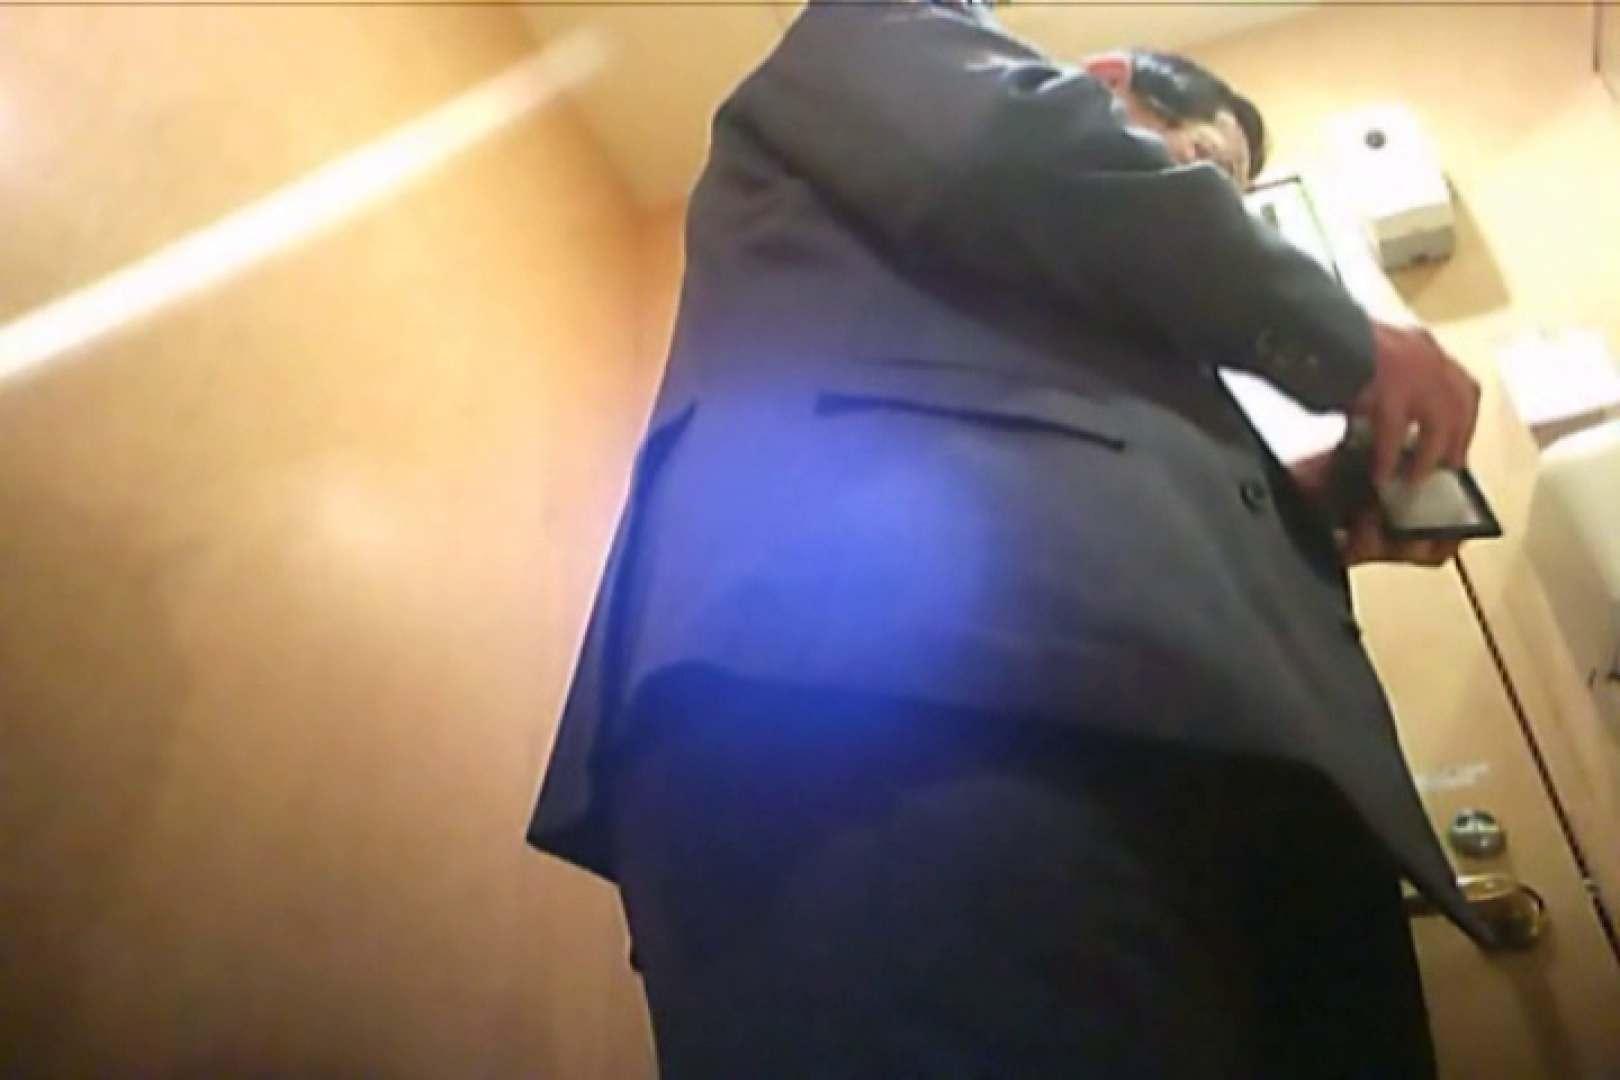 SEASON 2ND!掴み取りさんの洗面所覗き!in新幹線!VOL.01 念願の完全無修正 ゲイ流出動画キャプチャ 104連発 32